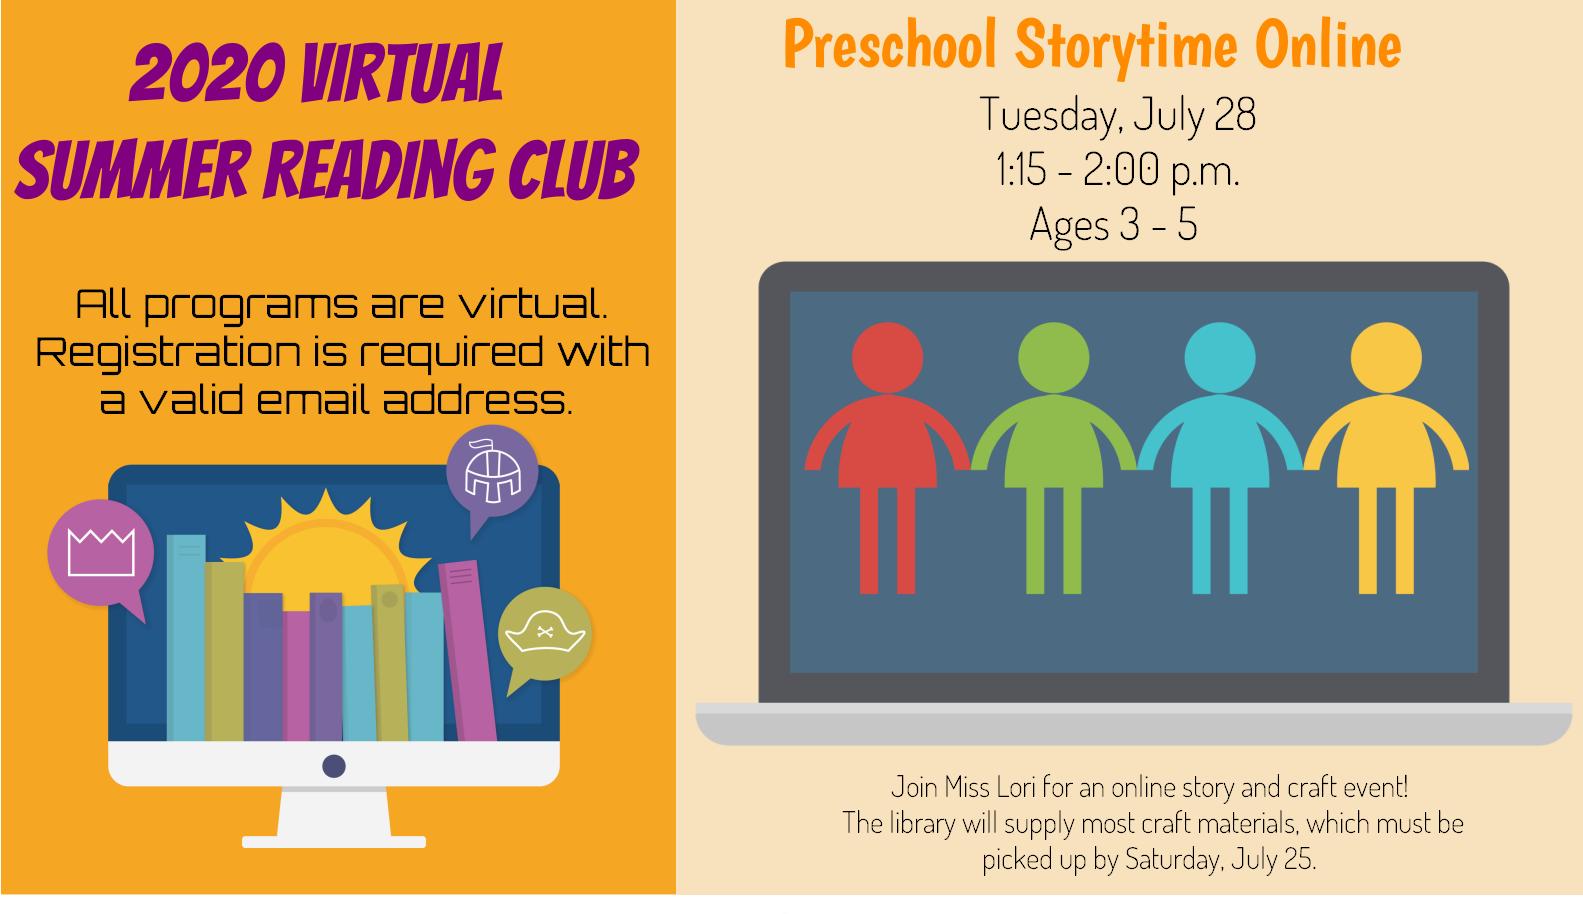 Preschool Storytime Online